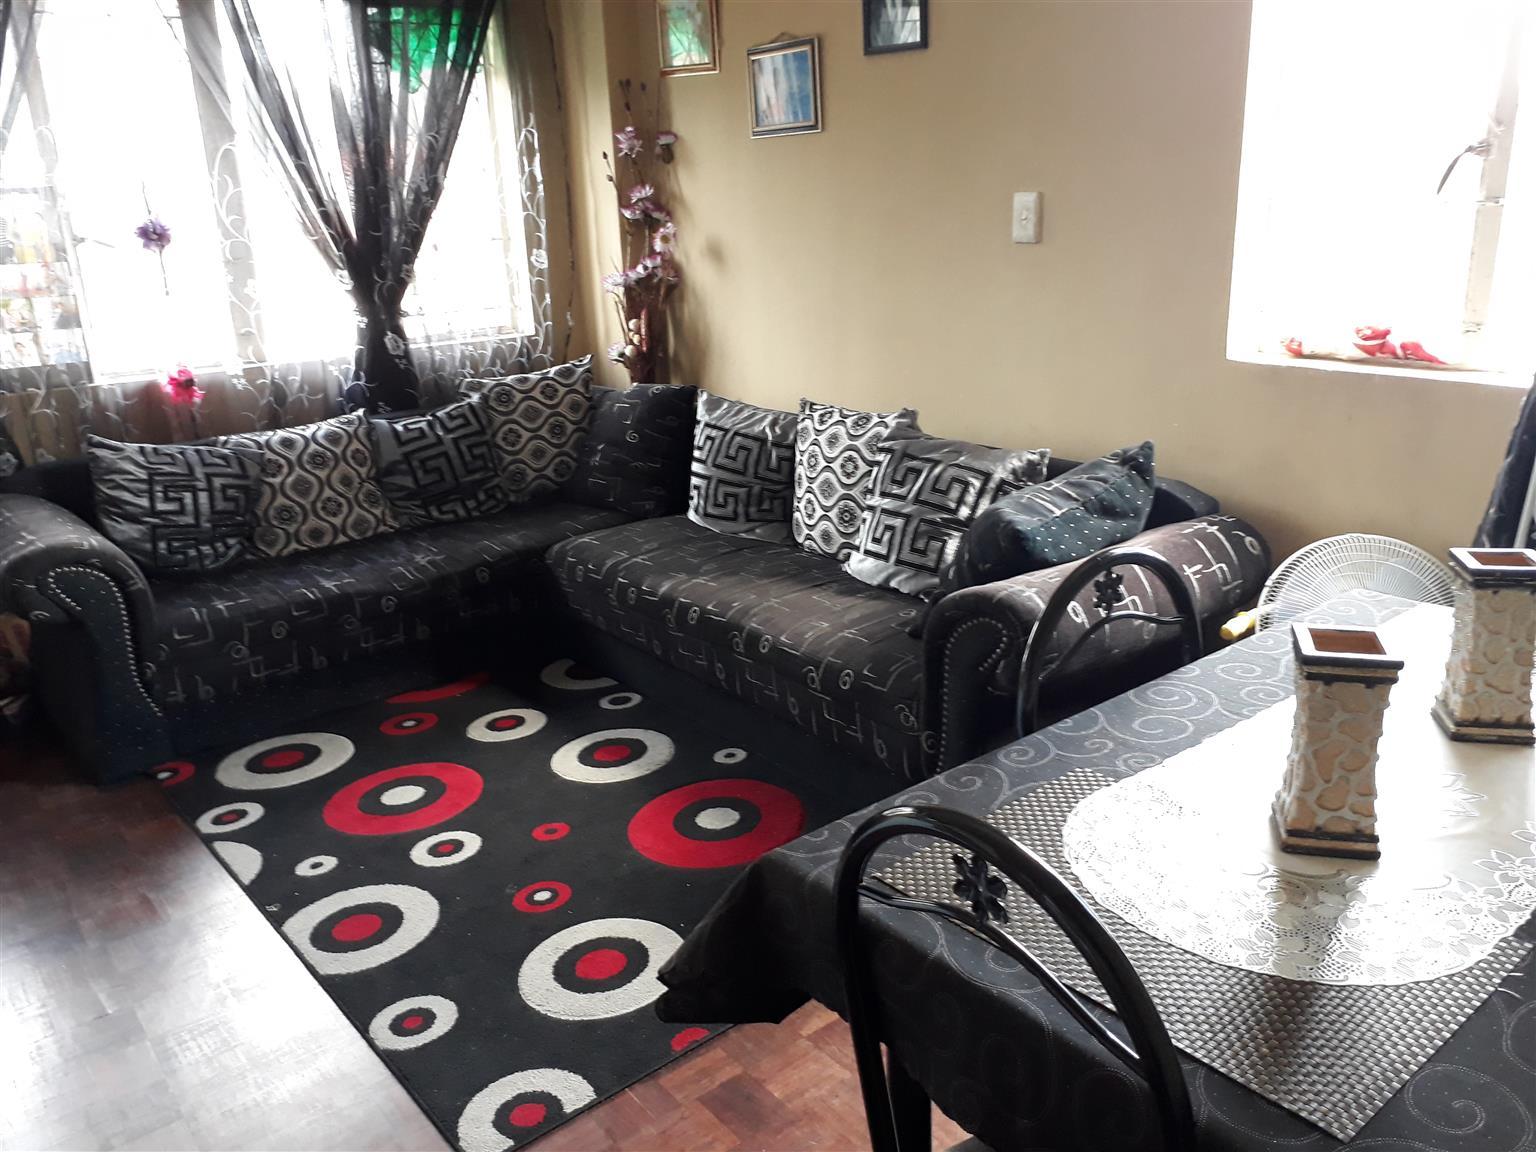 2 BEDROOM APARTMENT FOR SALE IN OVERPORT